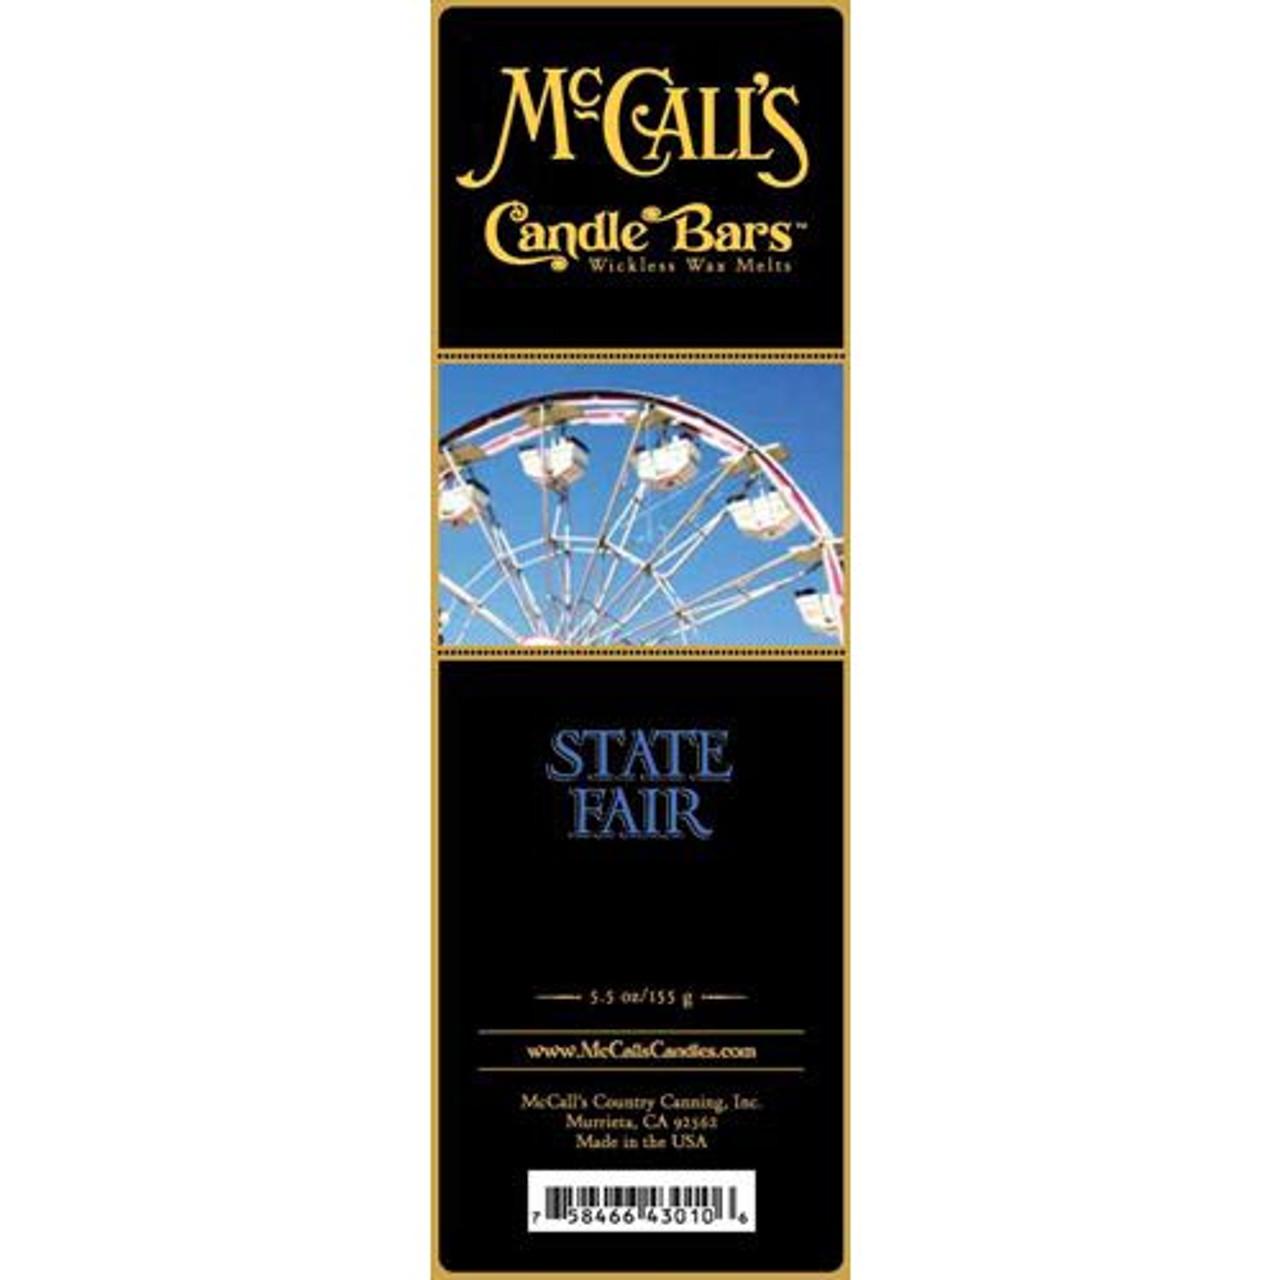 McCall/'s Candles Candle Bar 5.5 oz State Fair